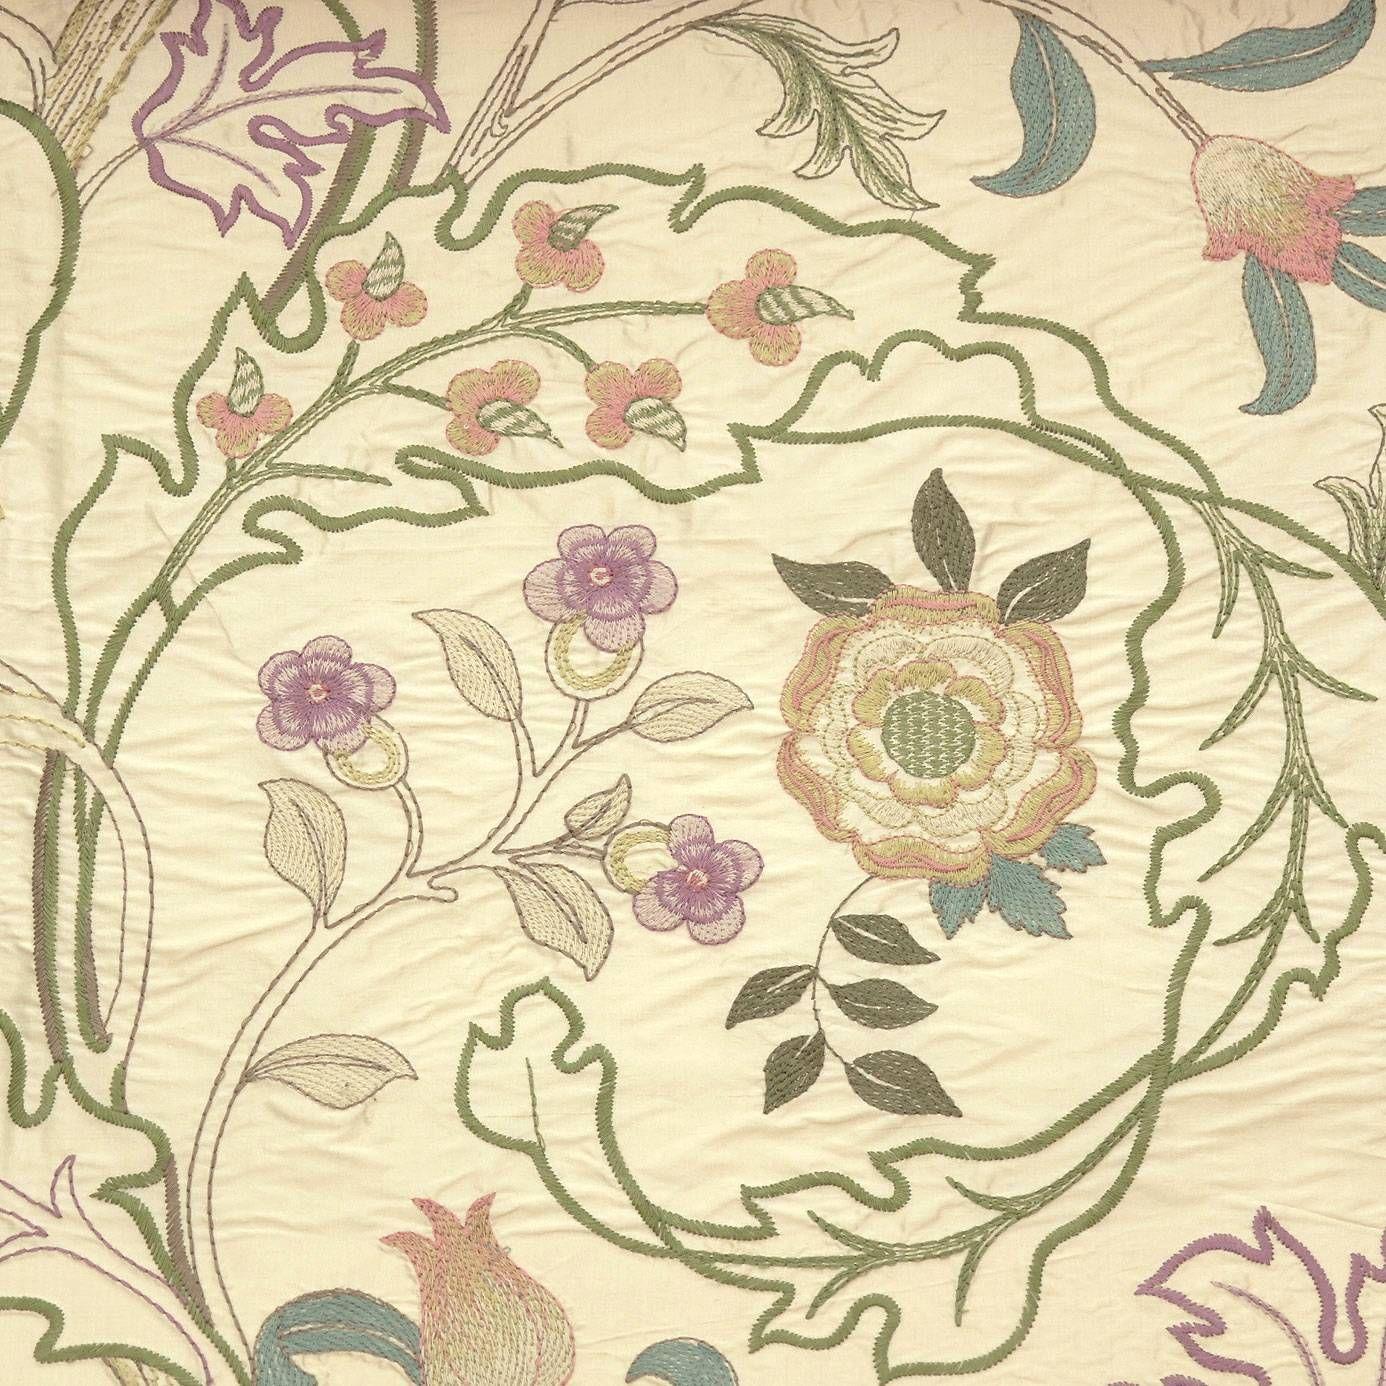 Mary isobel fabric rose artichoke william